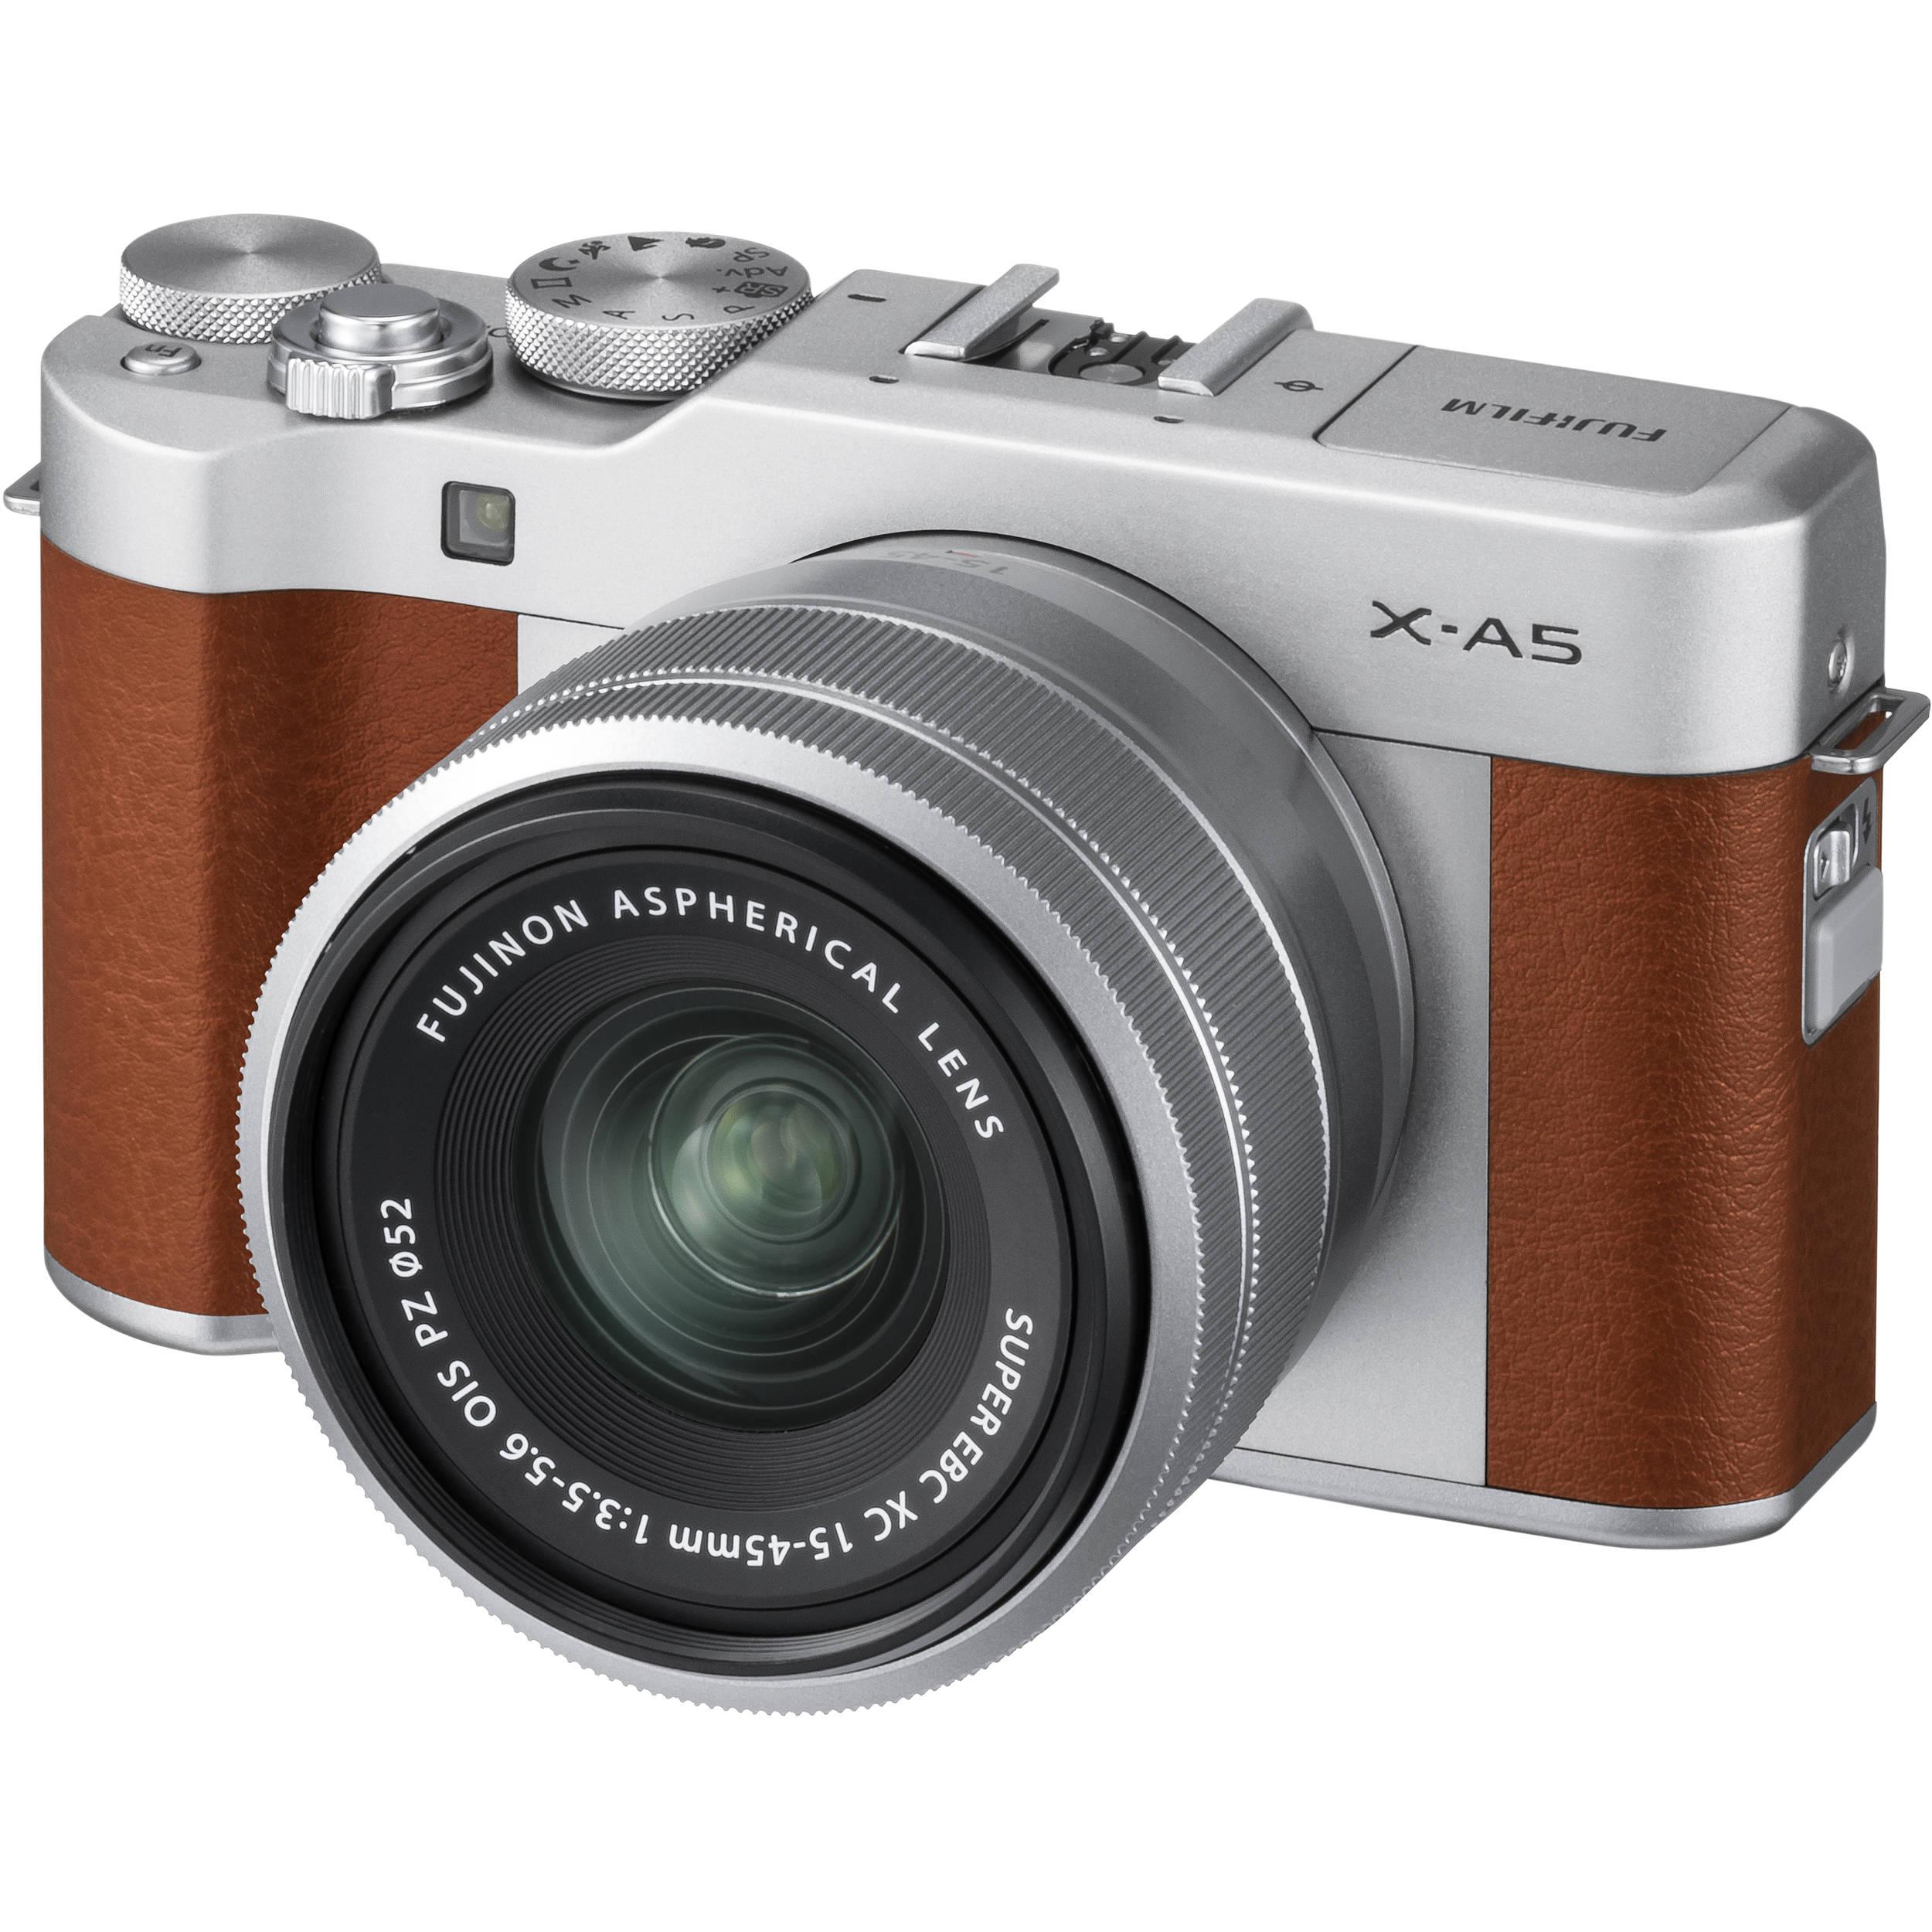 Fuji Camera: FUJIFILM X-A5 Mirrorless Digital Camera With 15-45mm 16568913